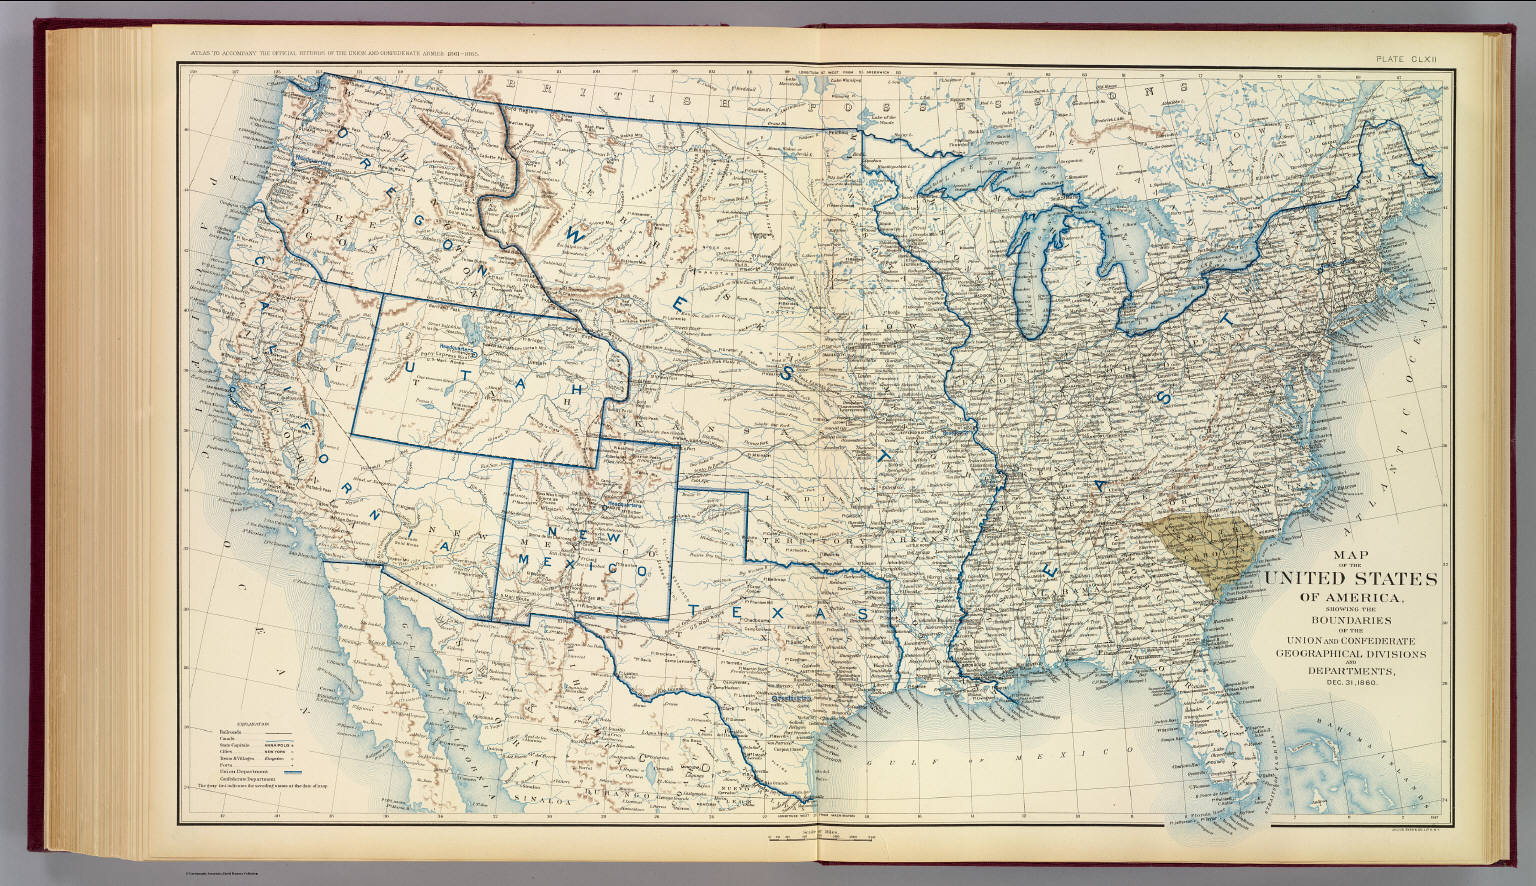 Usa dec 1860 david rumsey historical map collection usa dec 1860 m4hsunfo